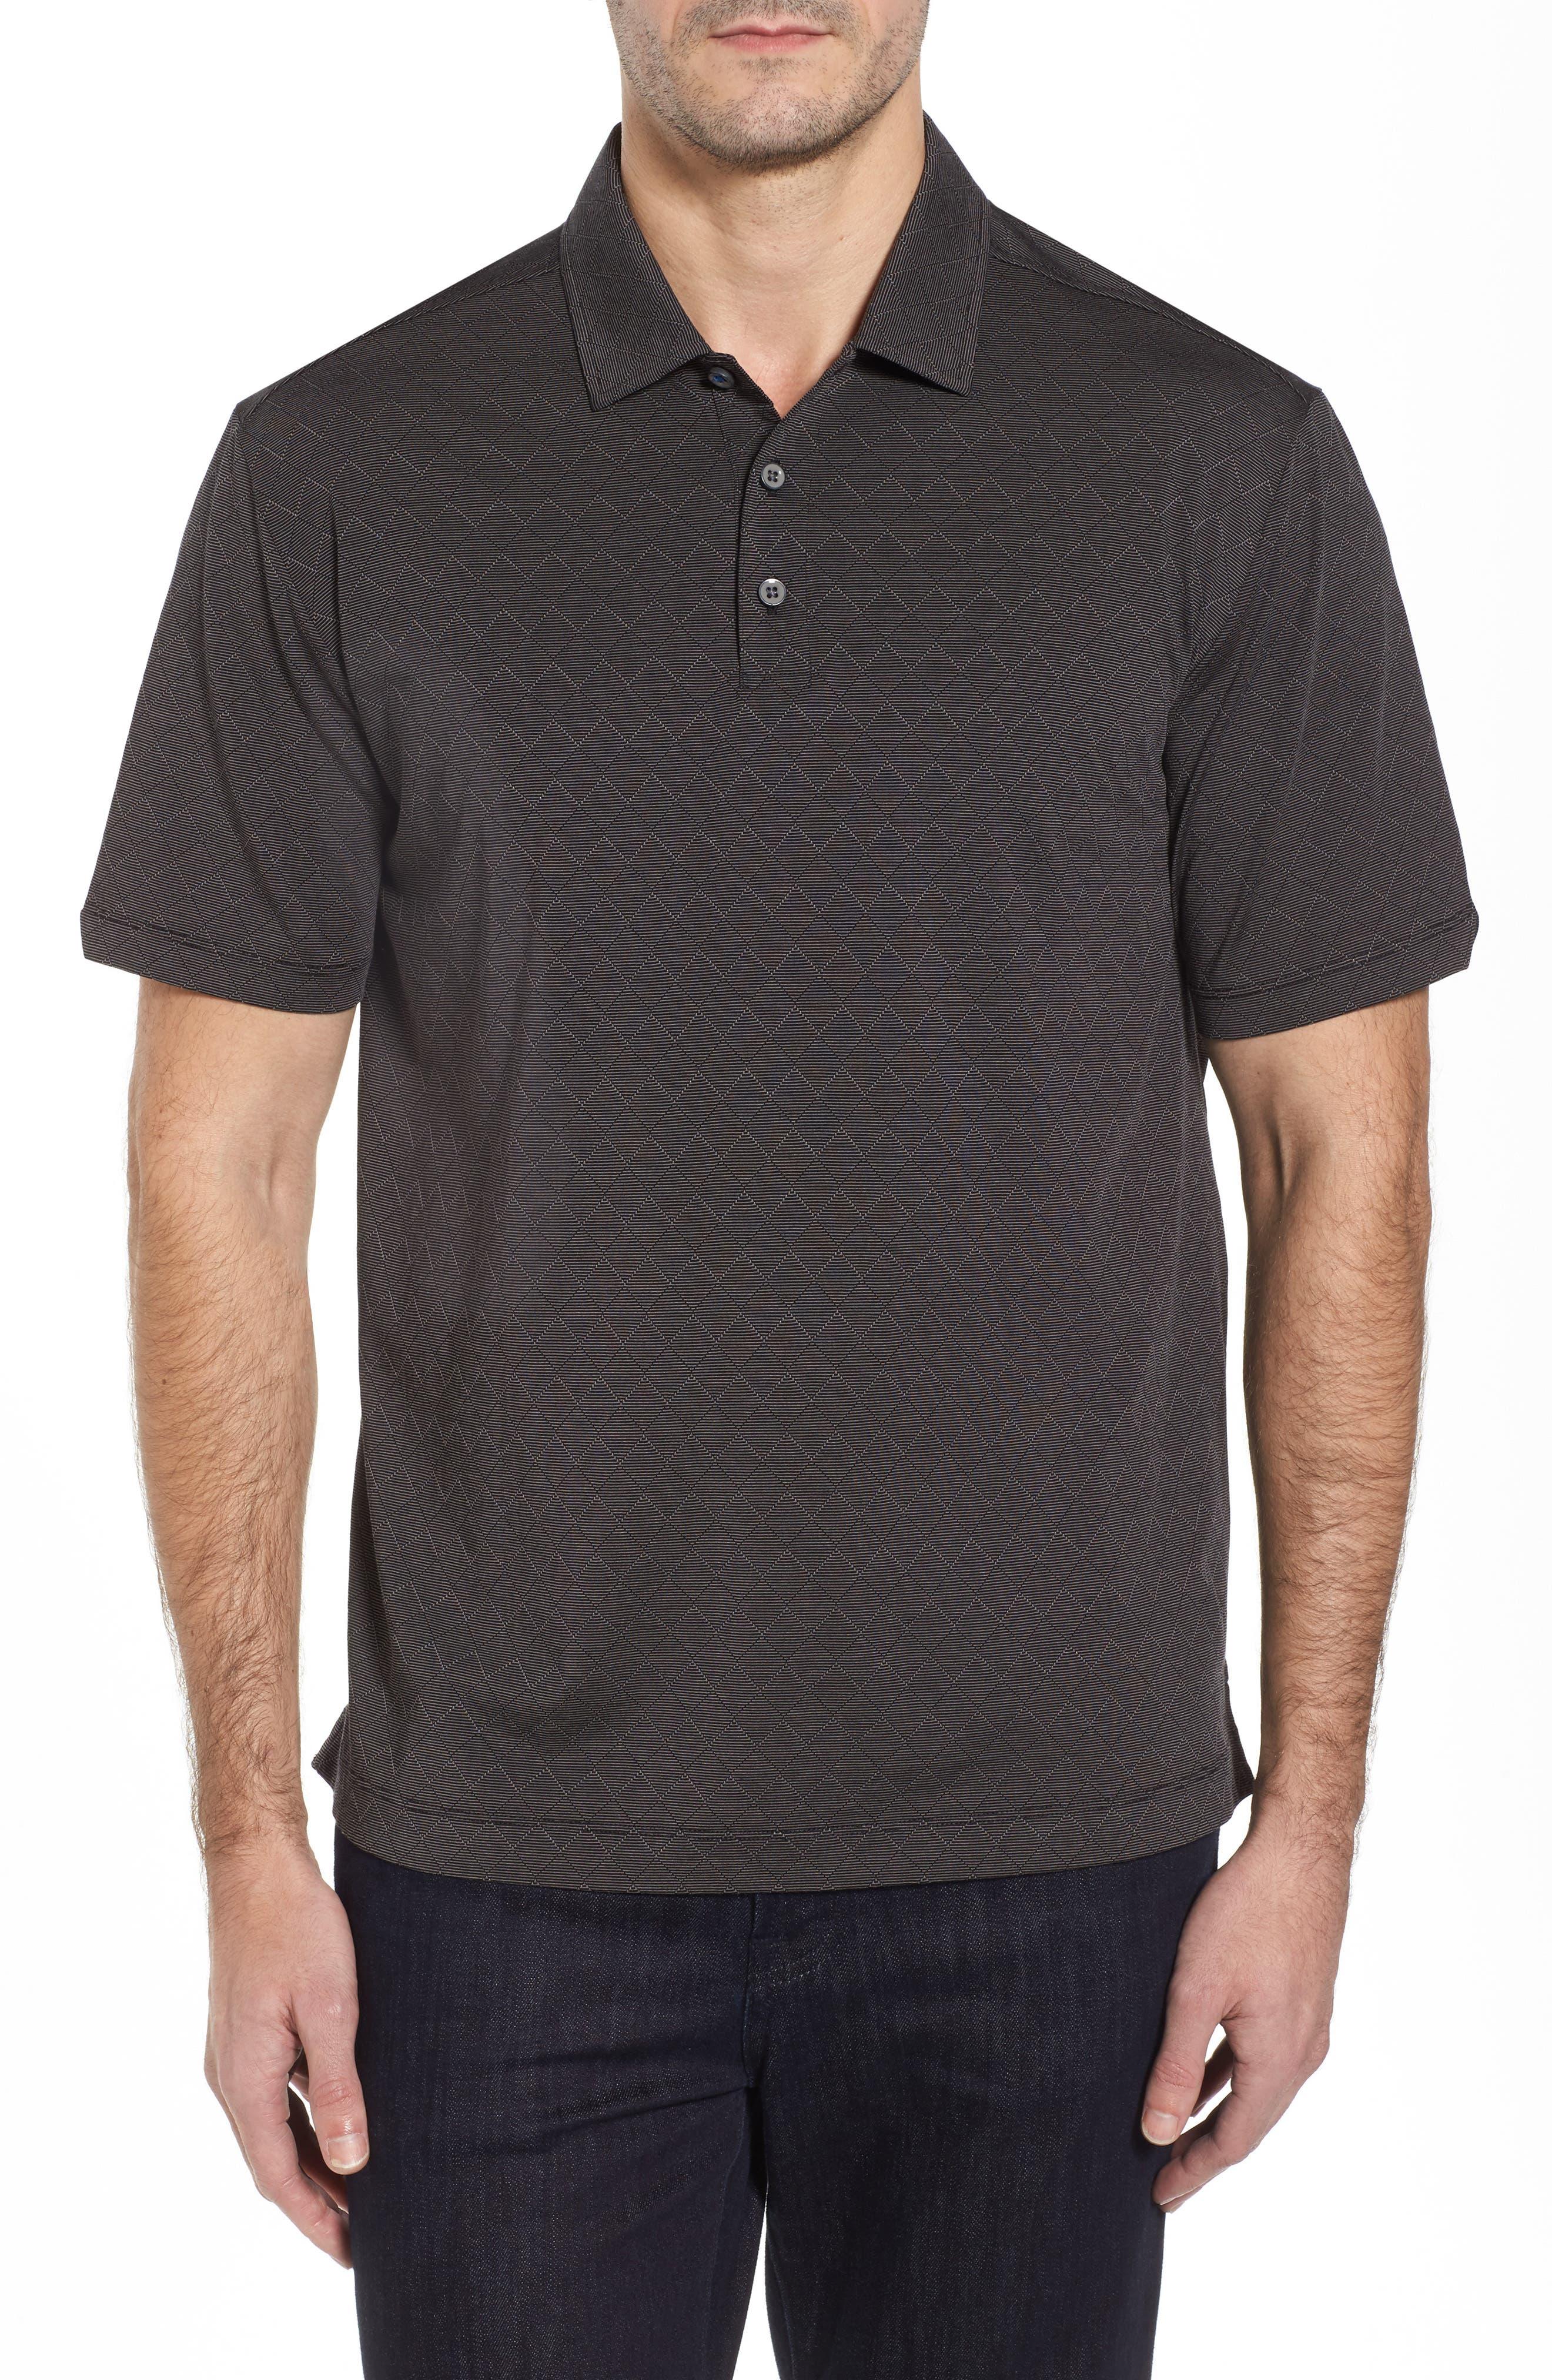 Alternate Image 1 Selected - Tommy Bahama Diamond Drift Spectator Polo Shirt